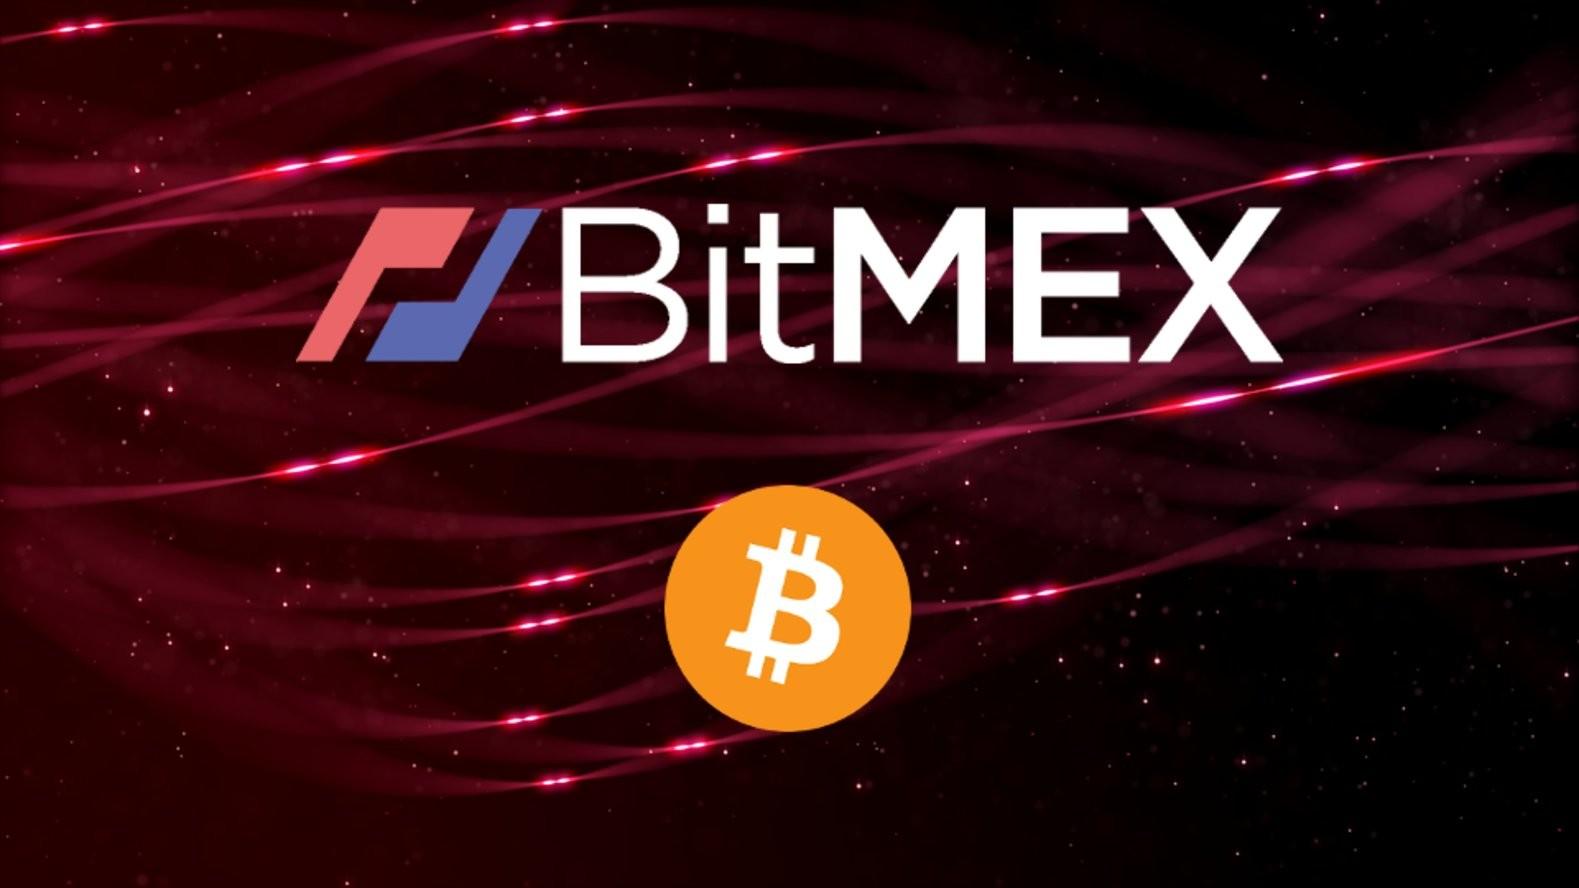 bitmex 440milyon dolar bitcoin cikis yapti